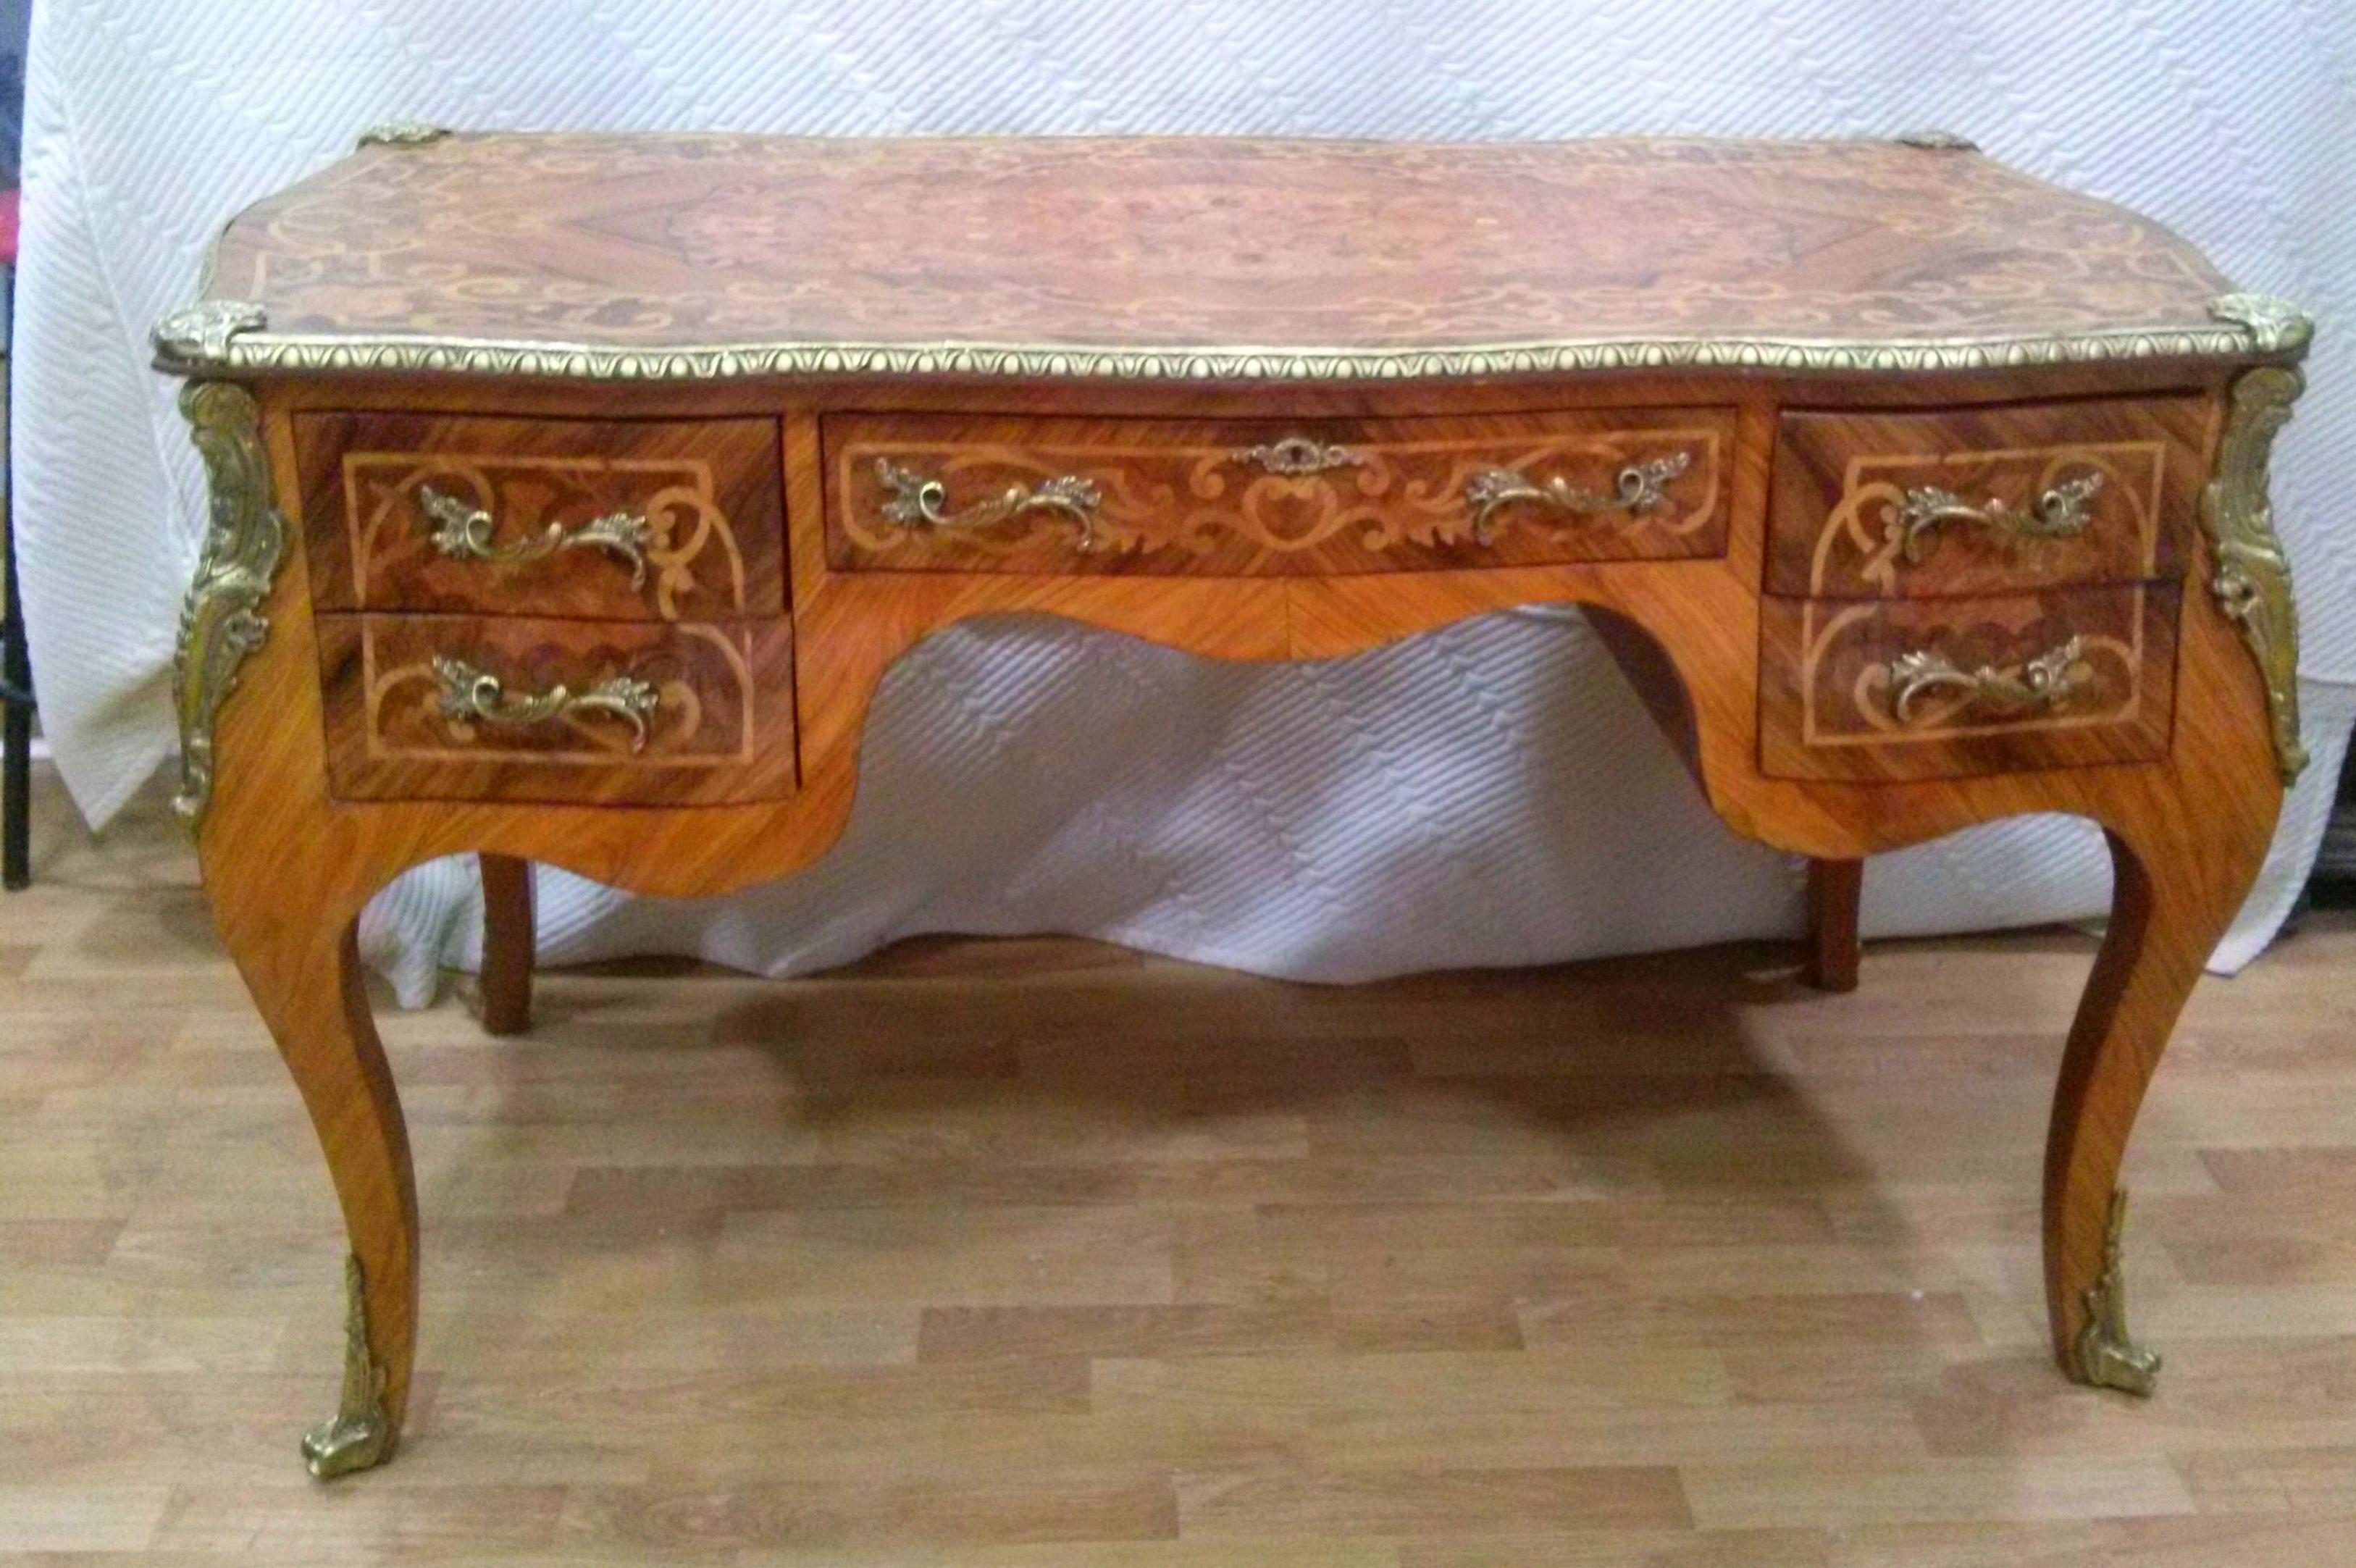 Muebles de madera antiguos interesting finest aparador - Como limpiar muebles de madera antiguos ...